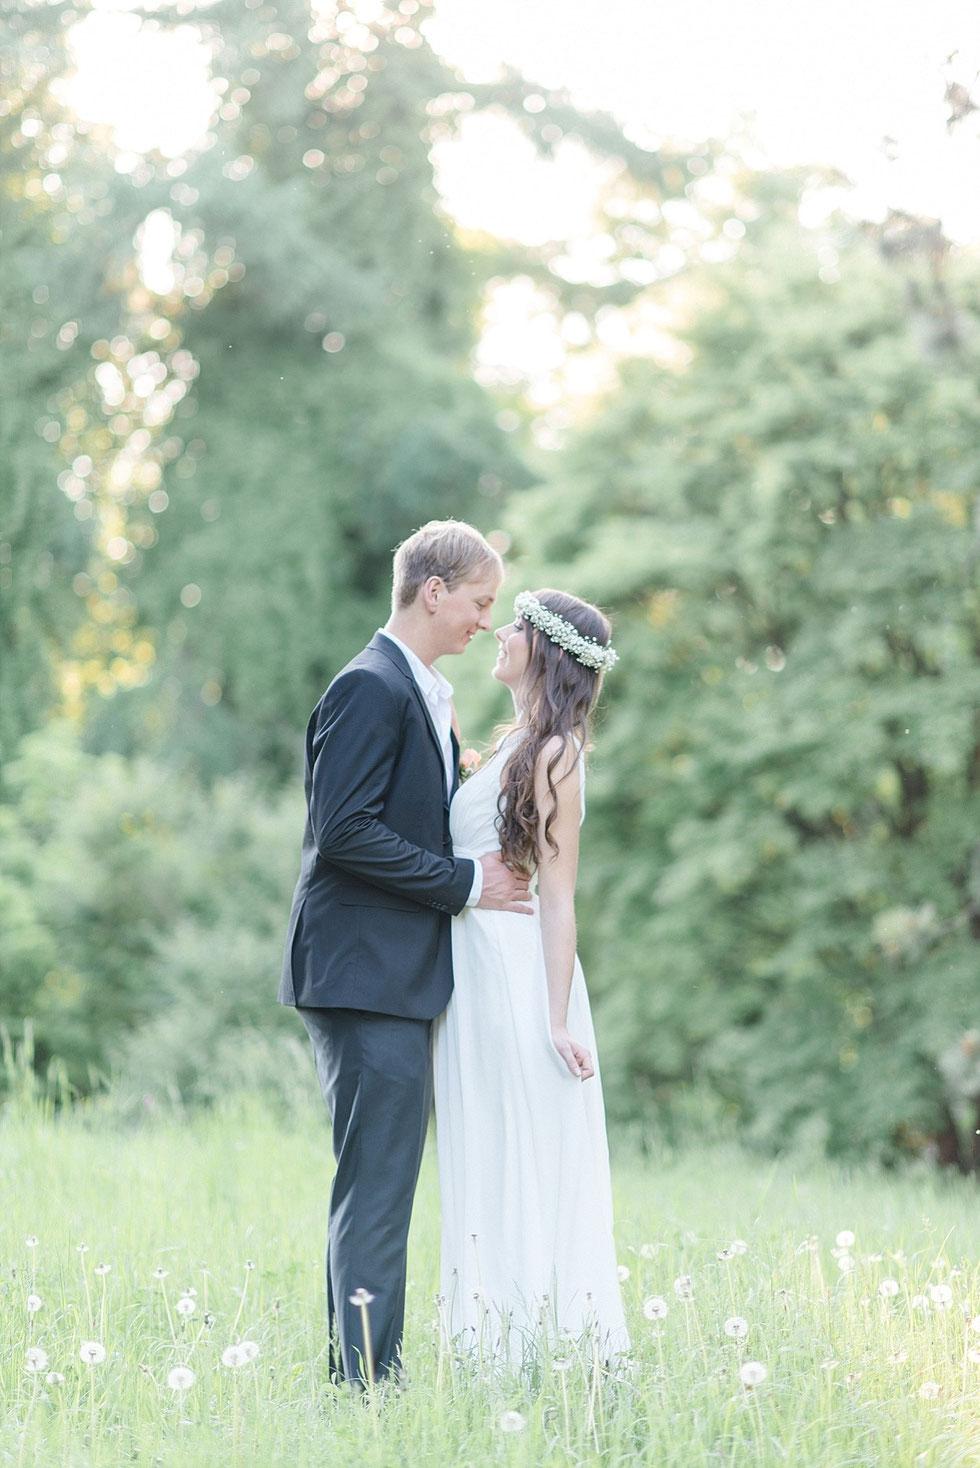 Hochzeitsfotografie Botanischer Garten Linz Julia Kollmann Photography